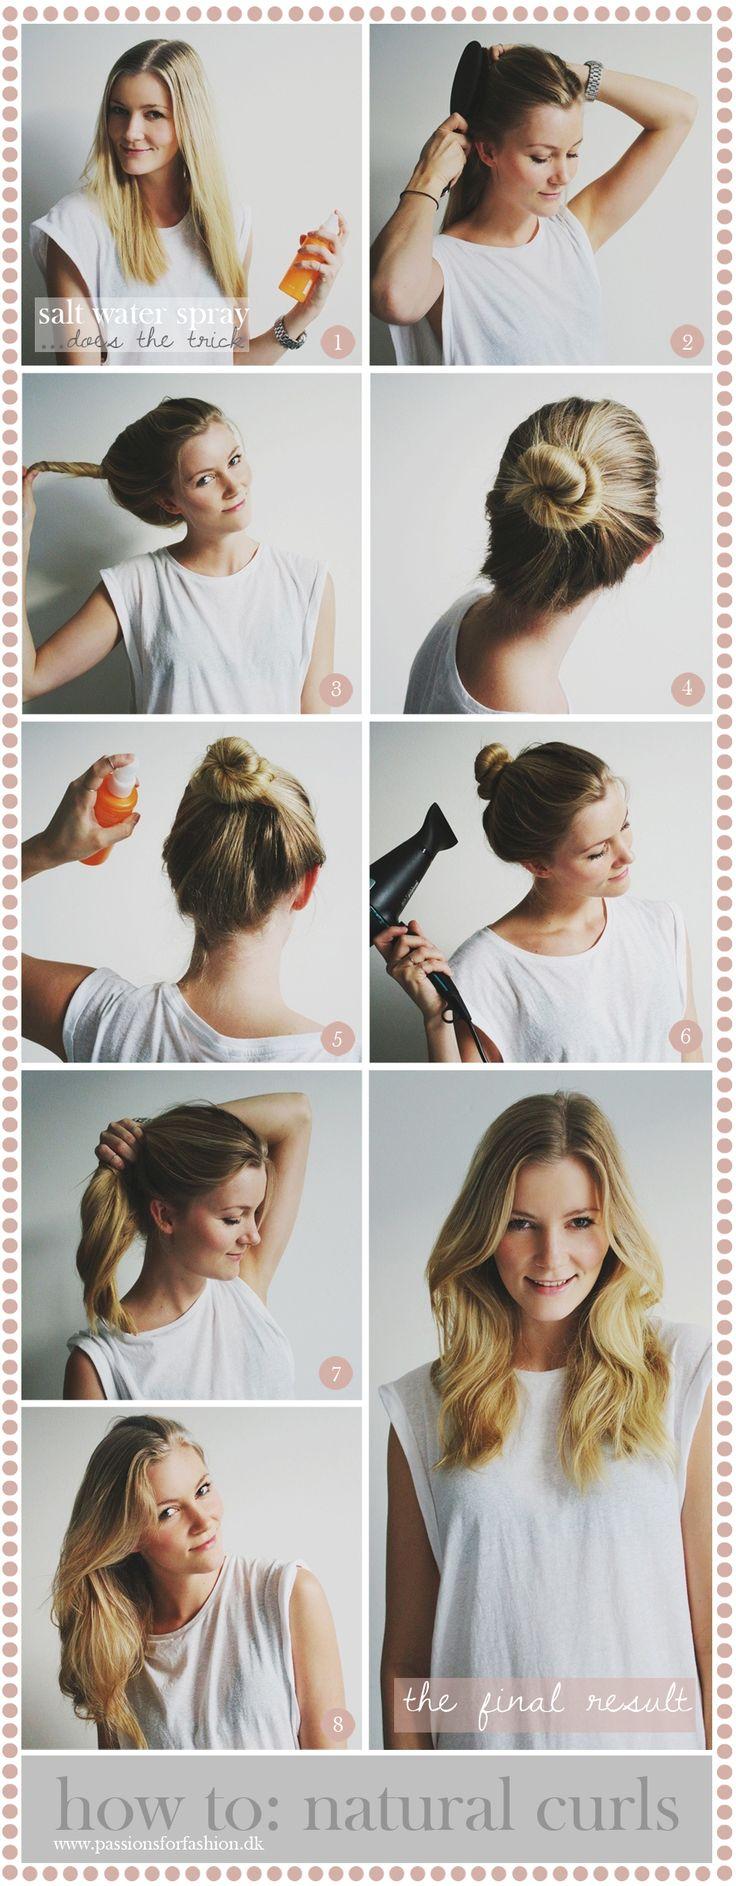 Ondas naturales | Natural curls